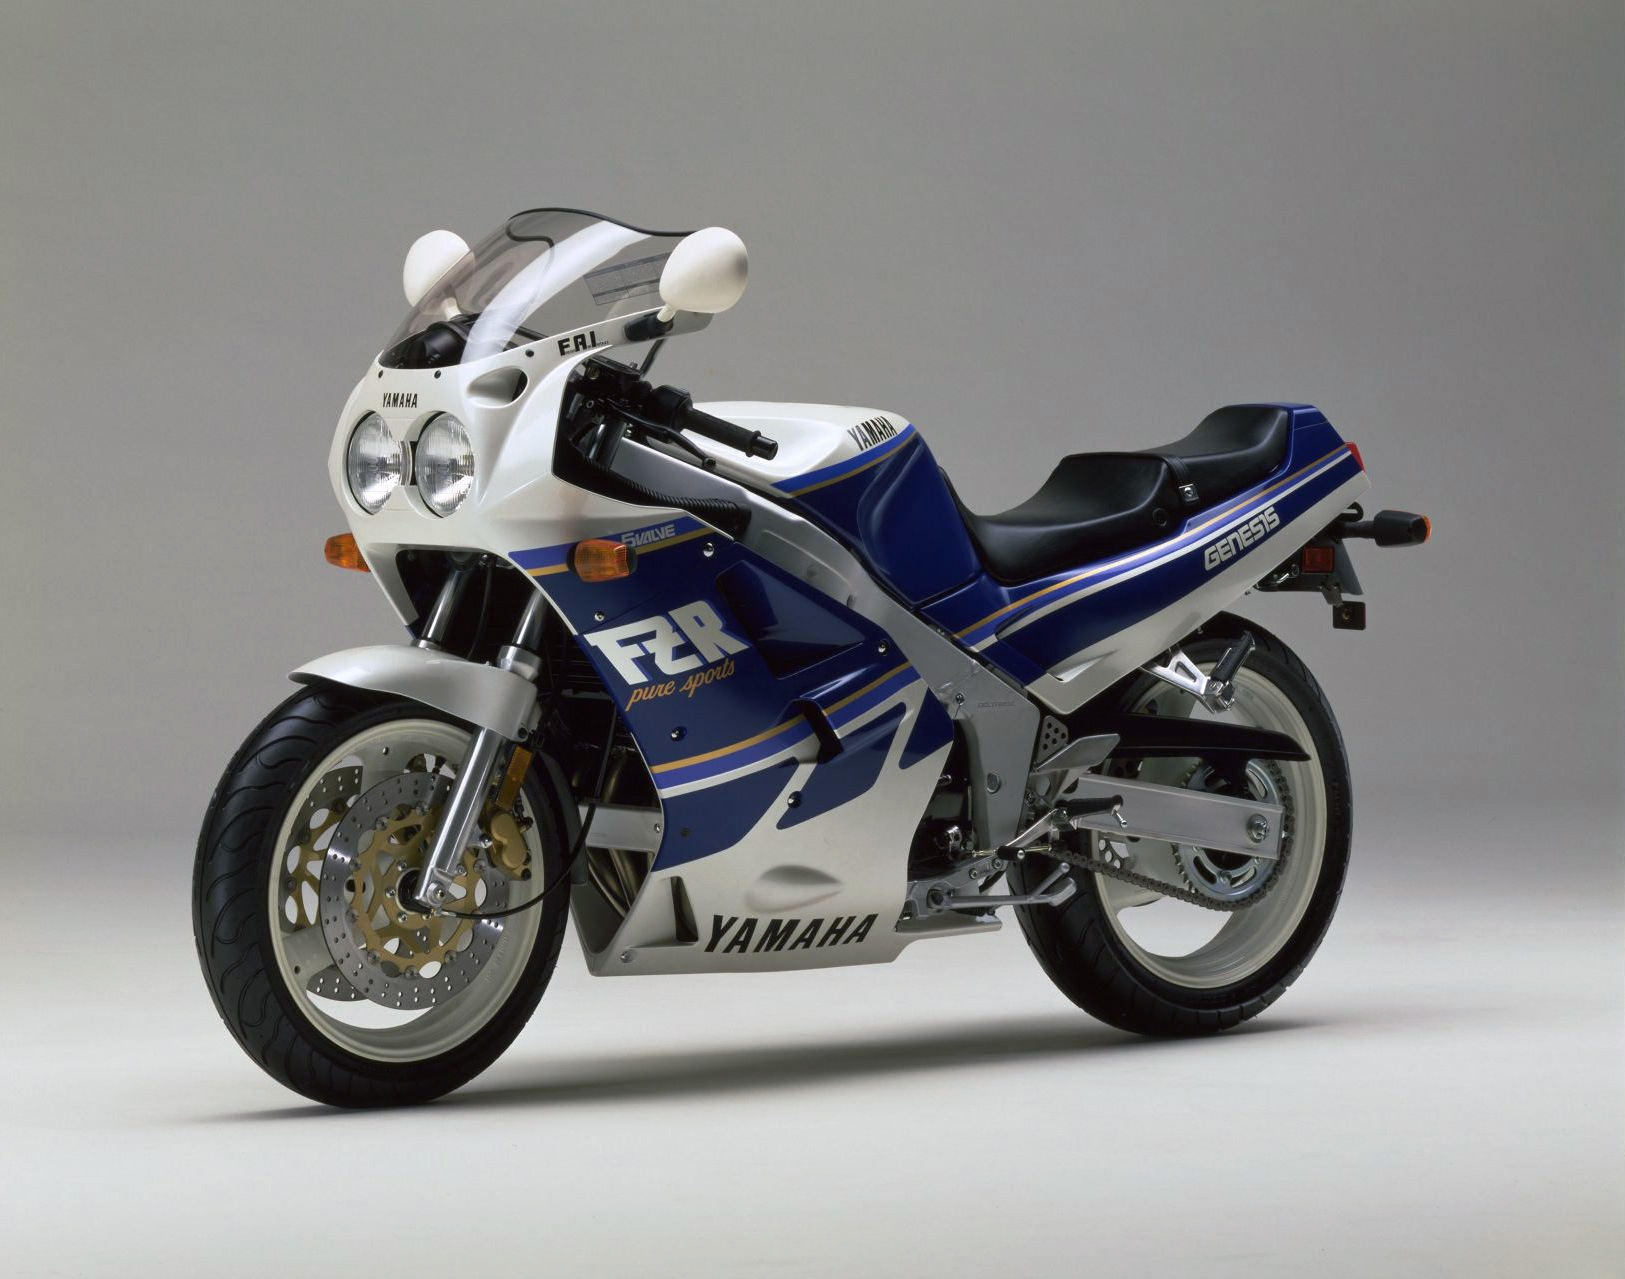 Yamaha FZR 1000 2